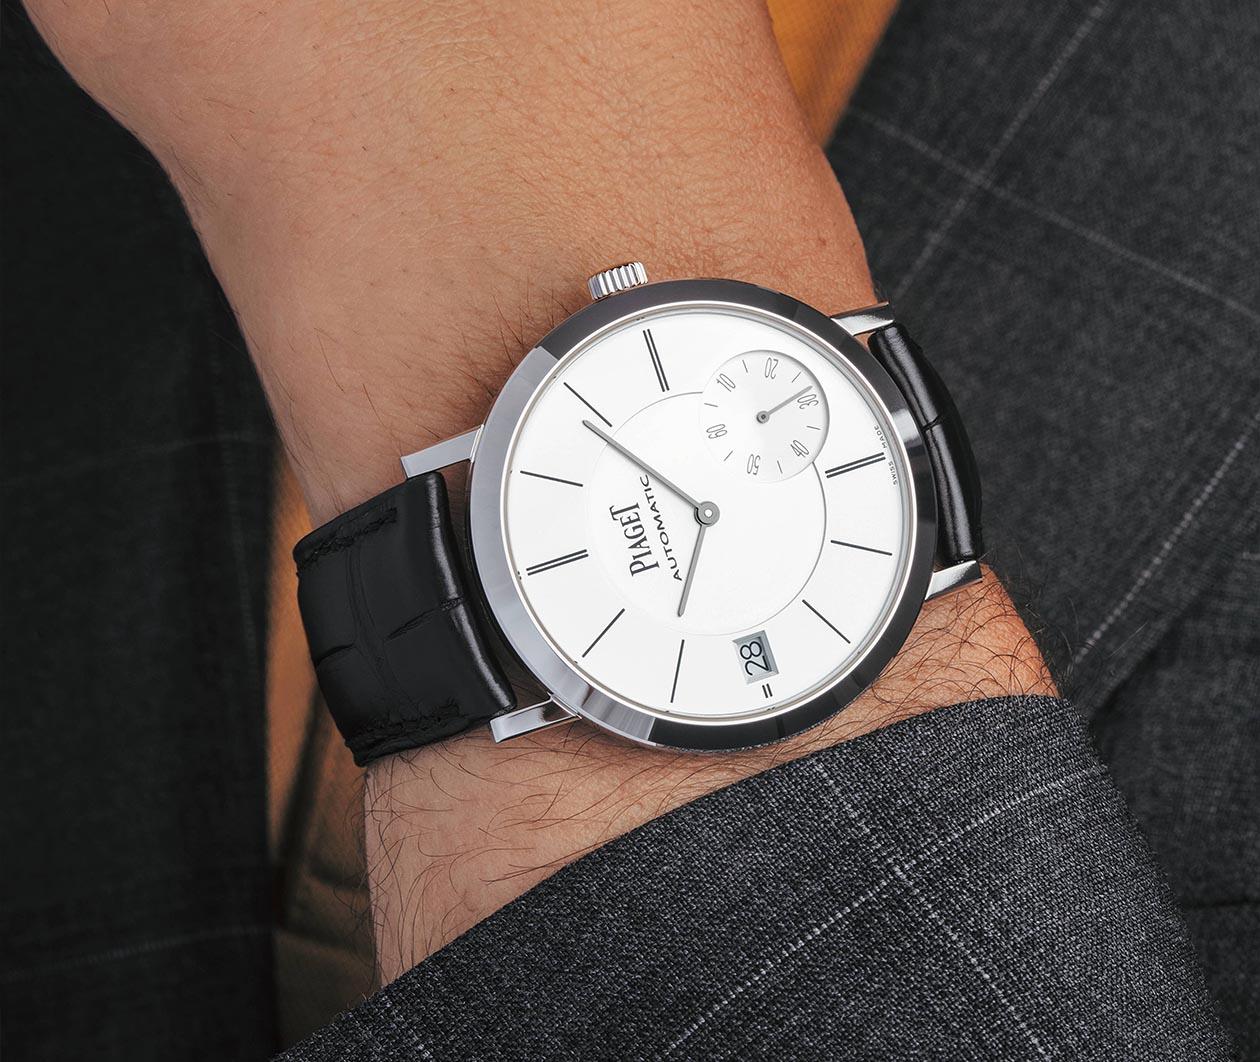 Piaget Altiplano watch G0A38130 Carousel 2 FINAL